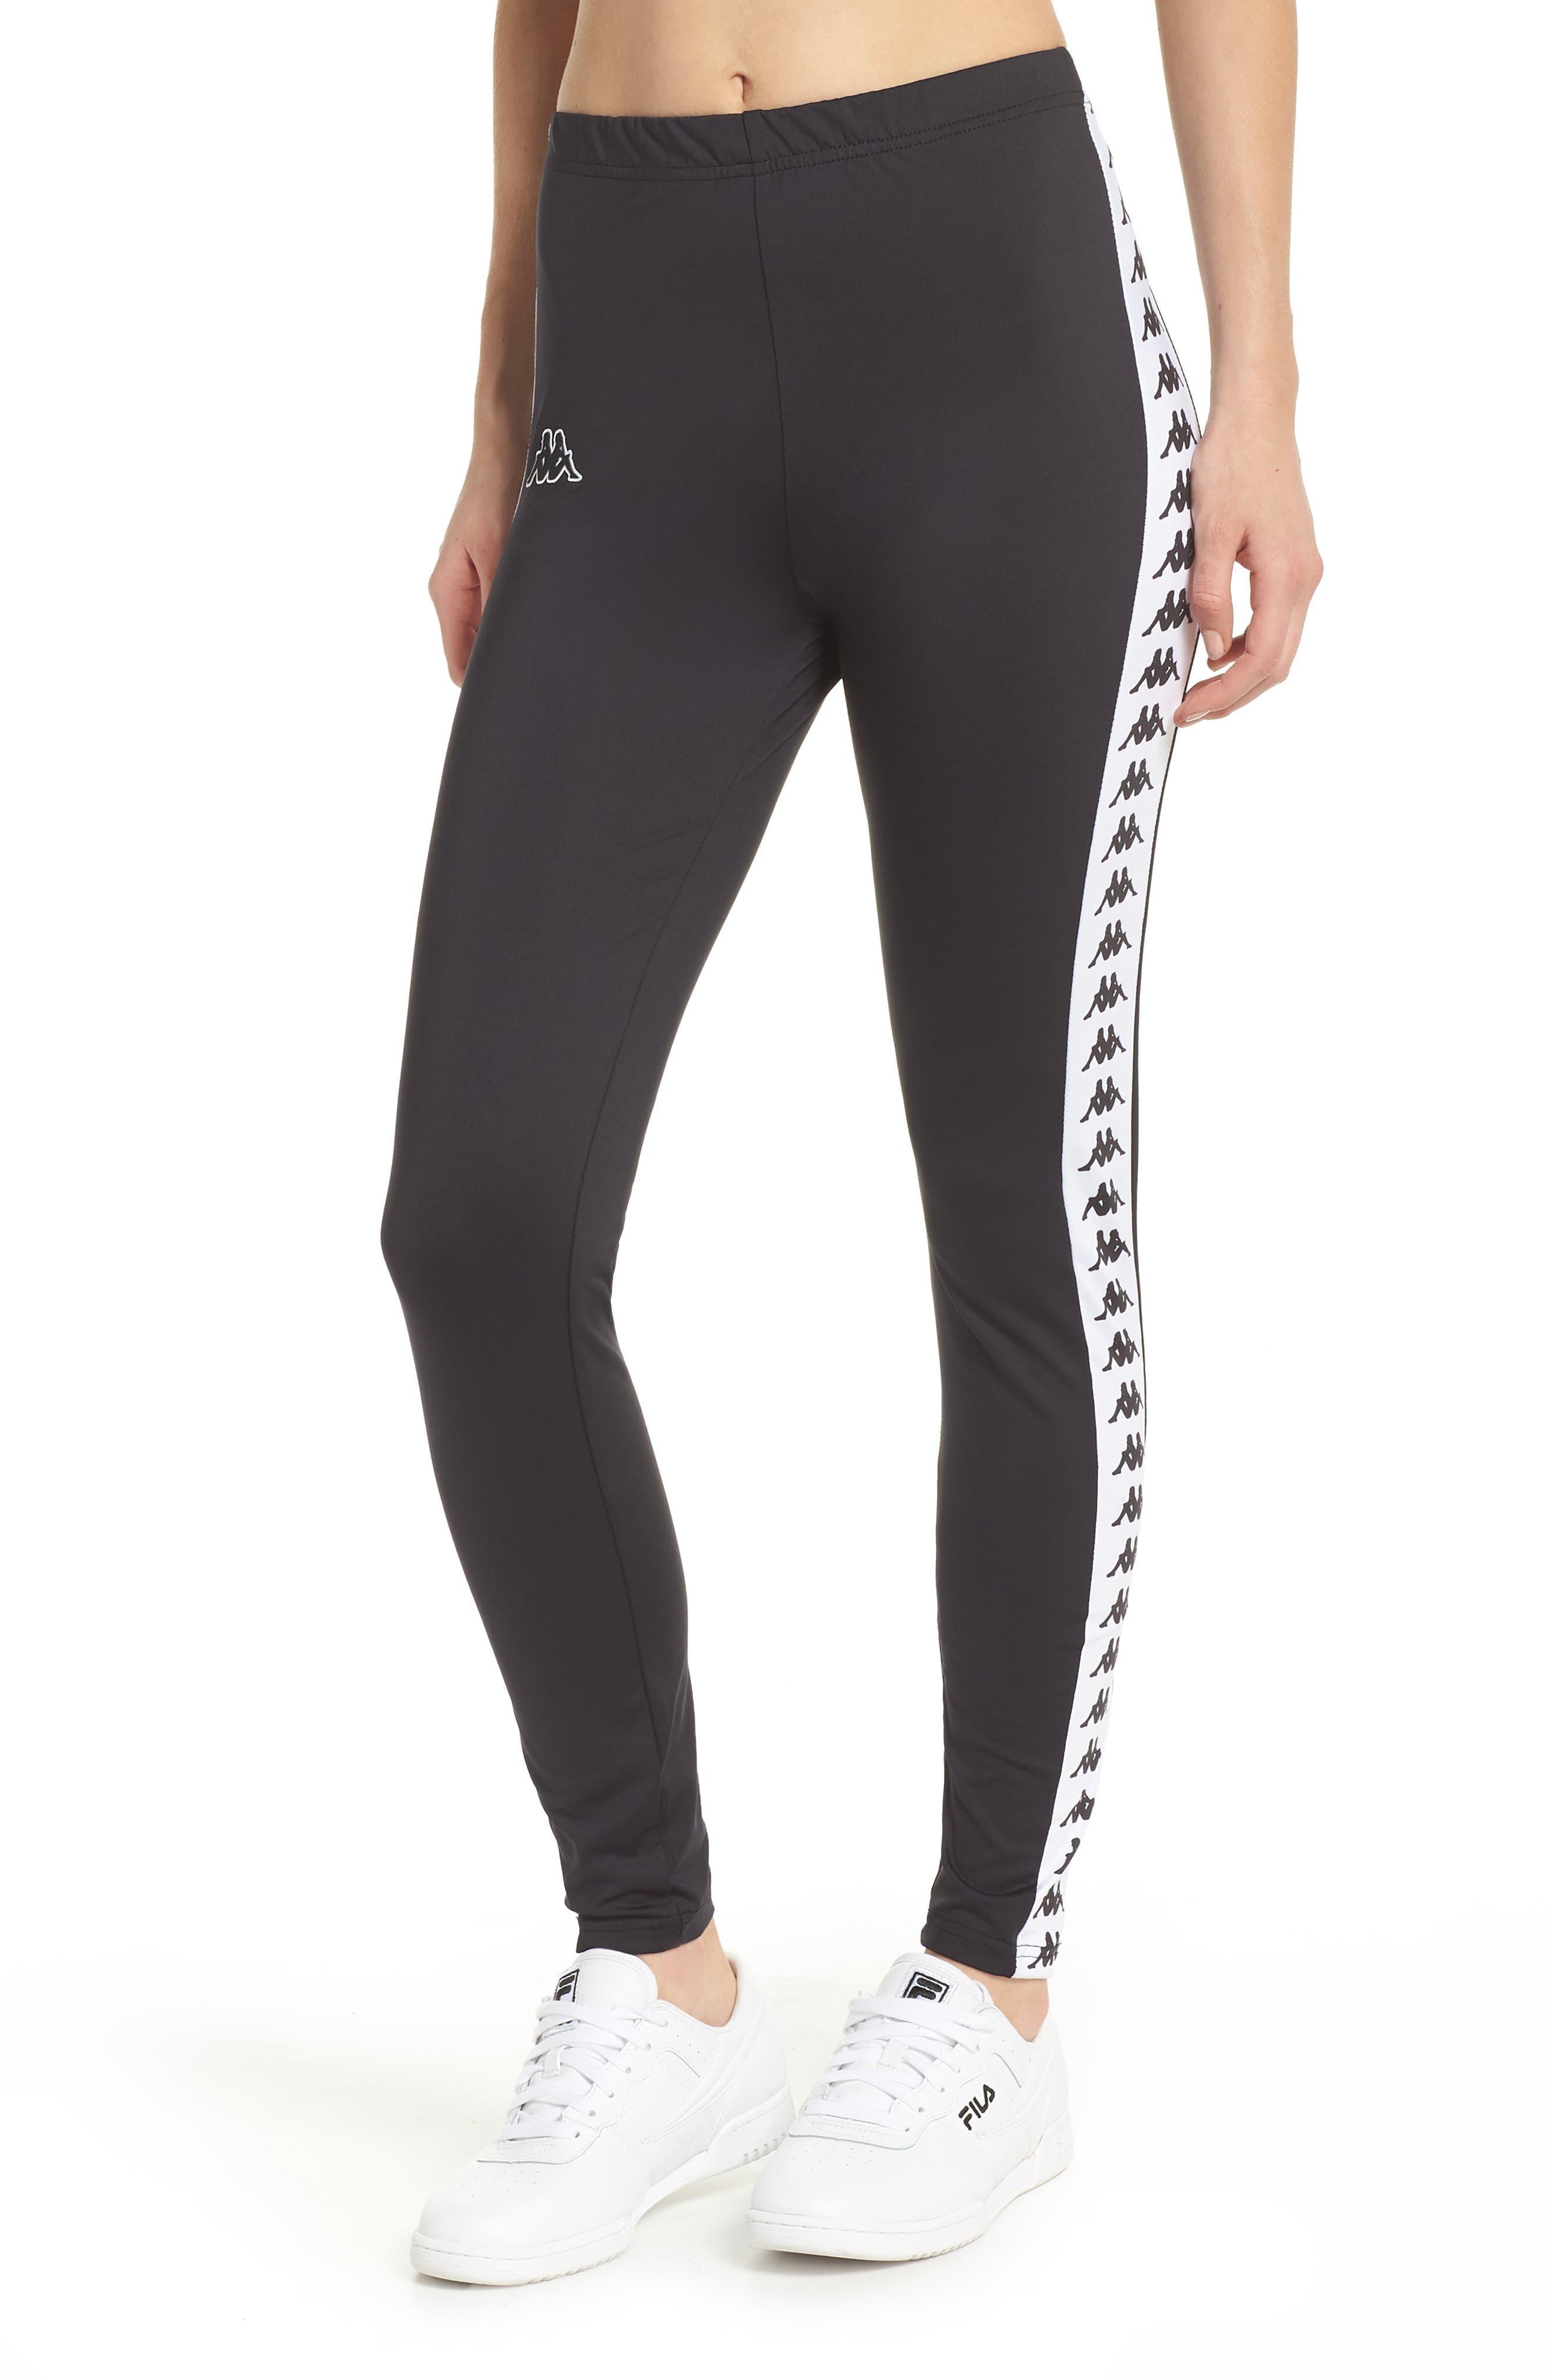 Banda Leggings,                         Main,                         color, Black/ White